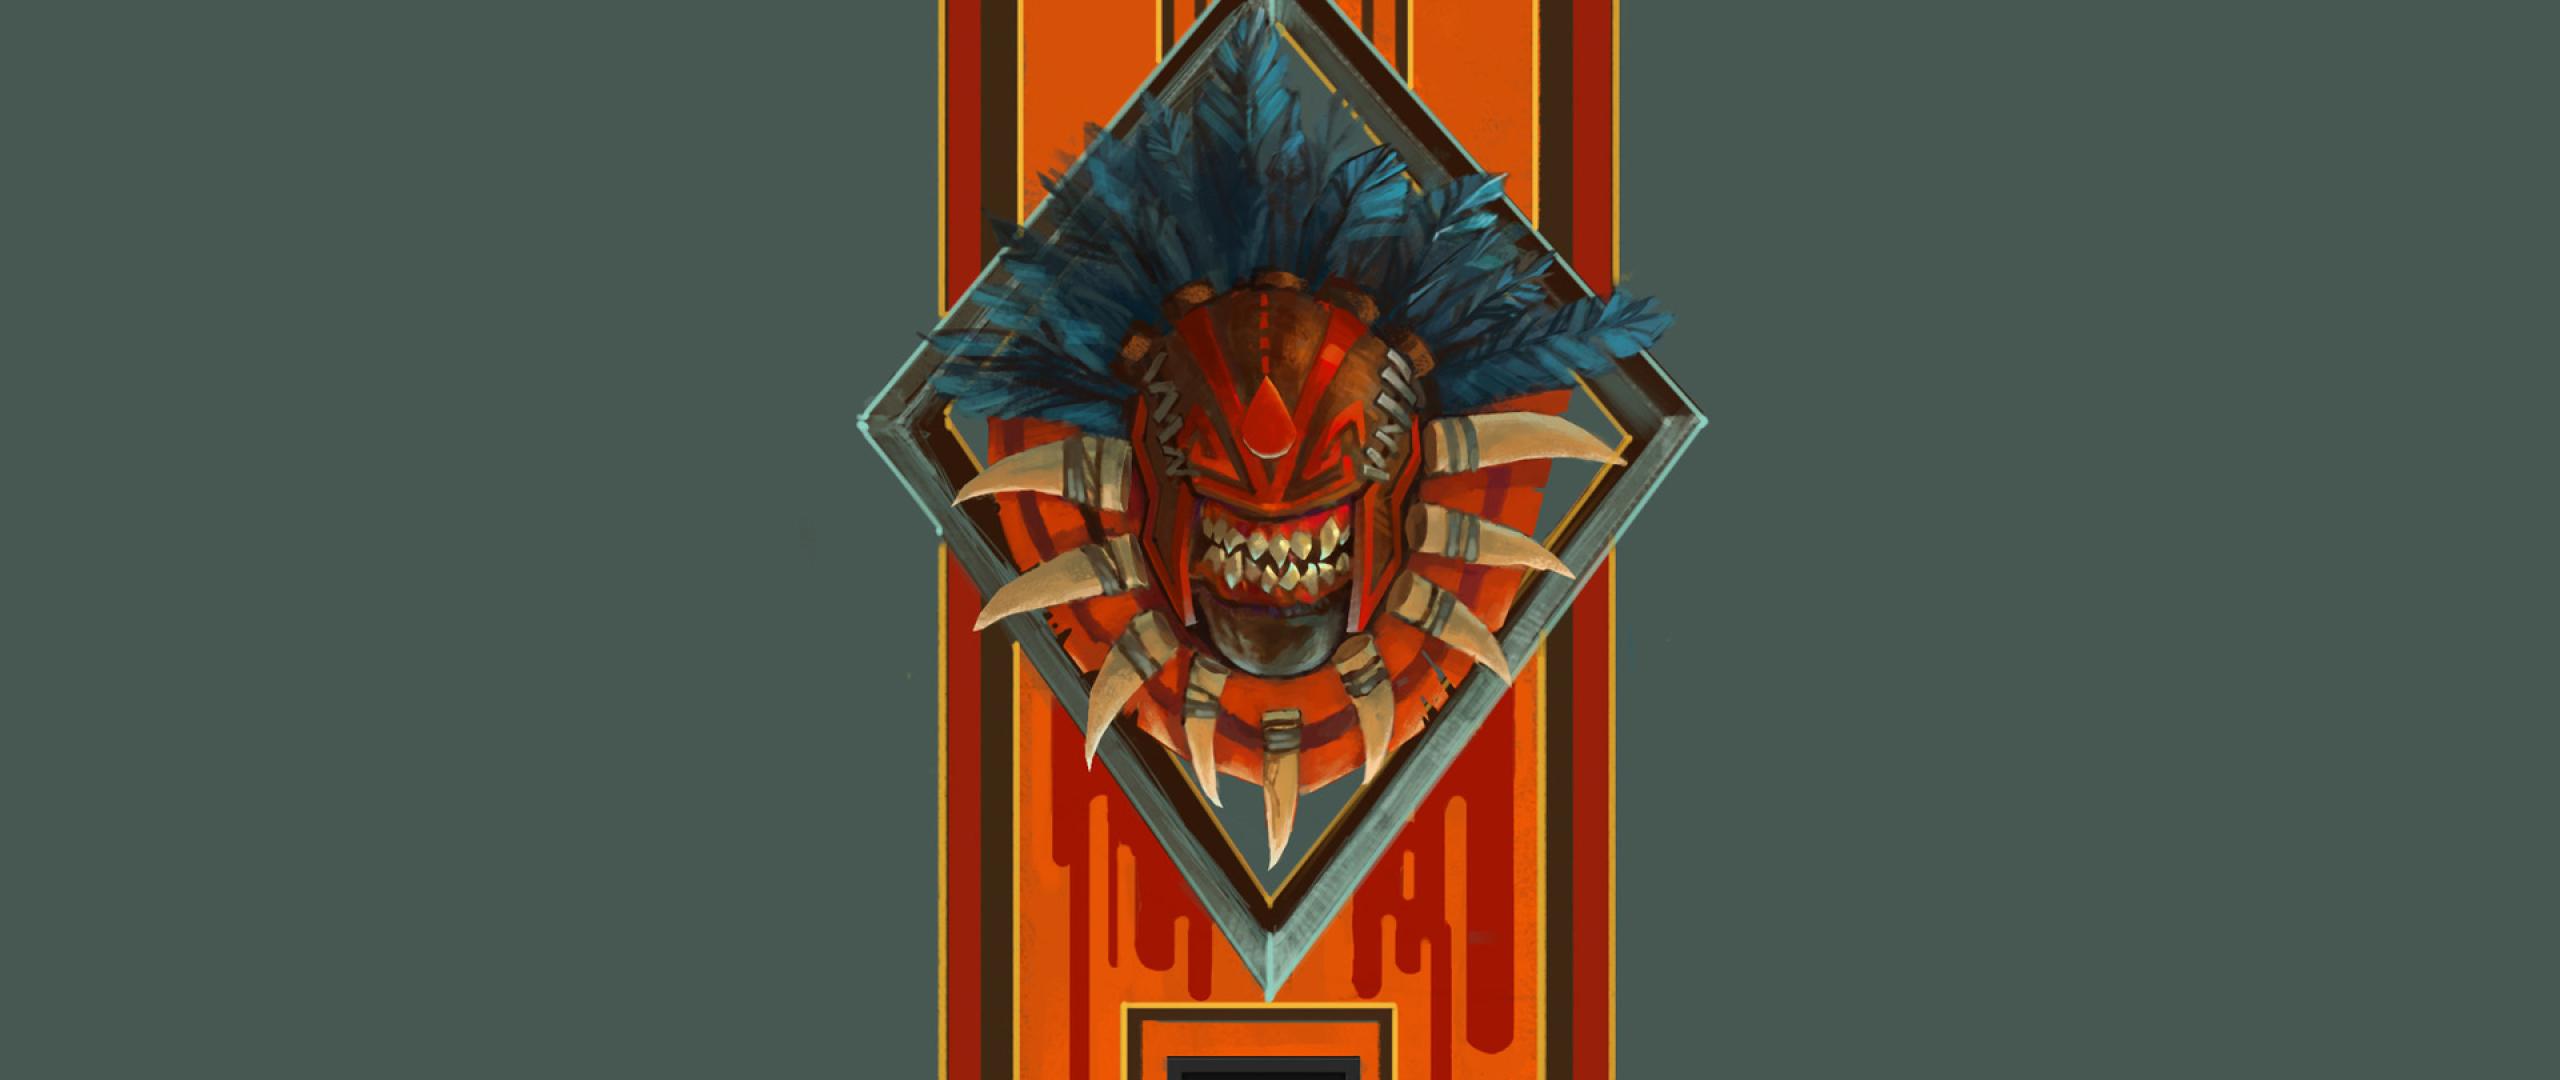 Strygwyr Bloodseeker Dota 2 Full HD Wallpaper